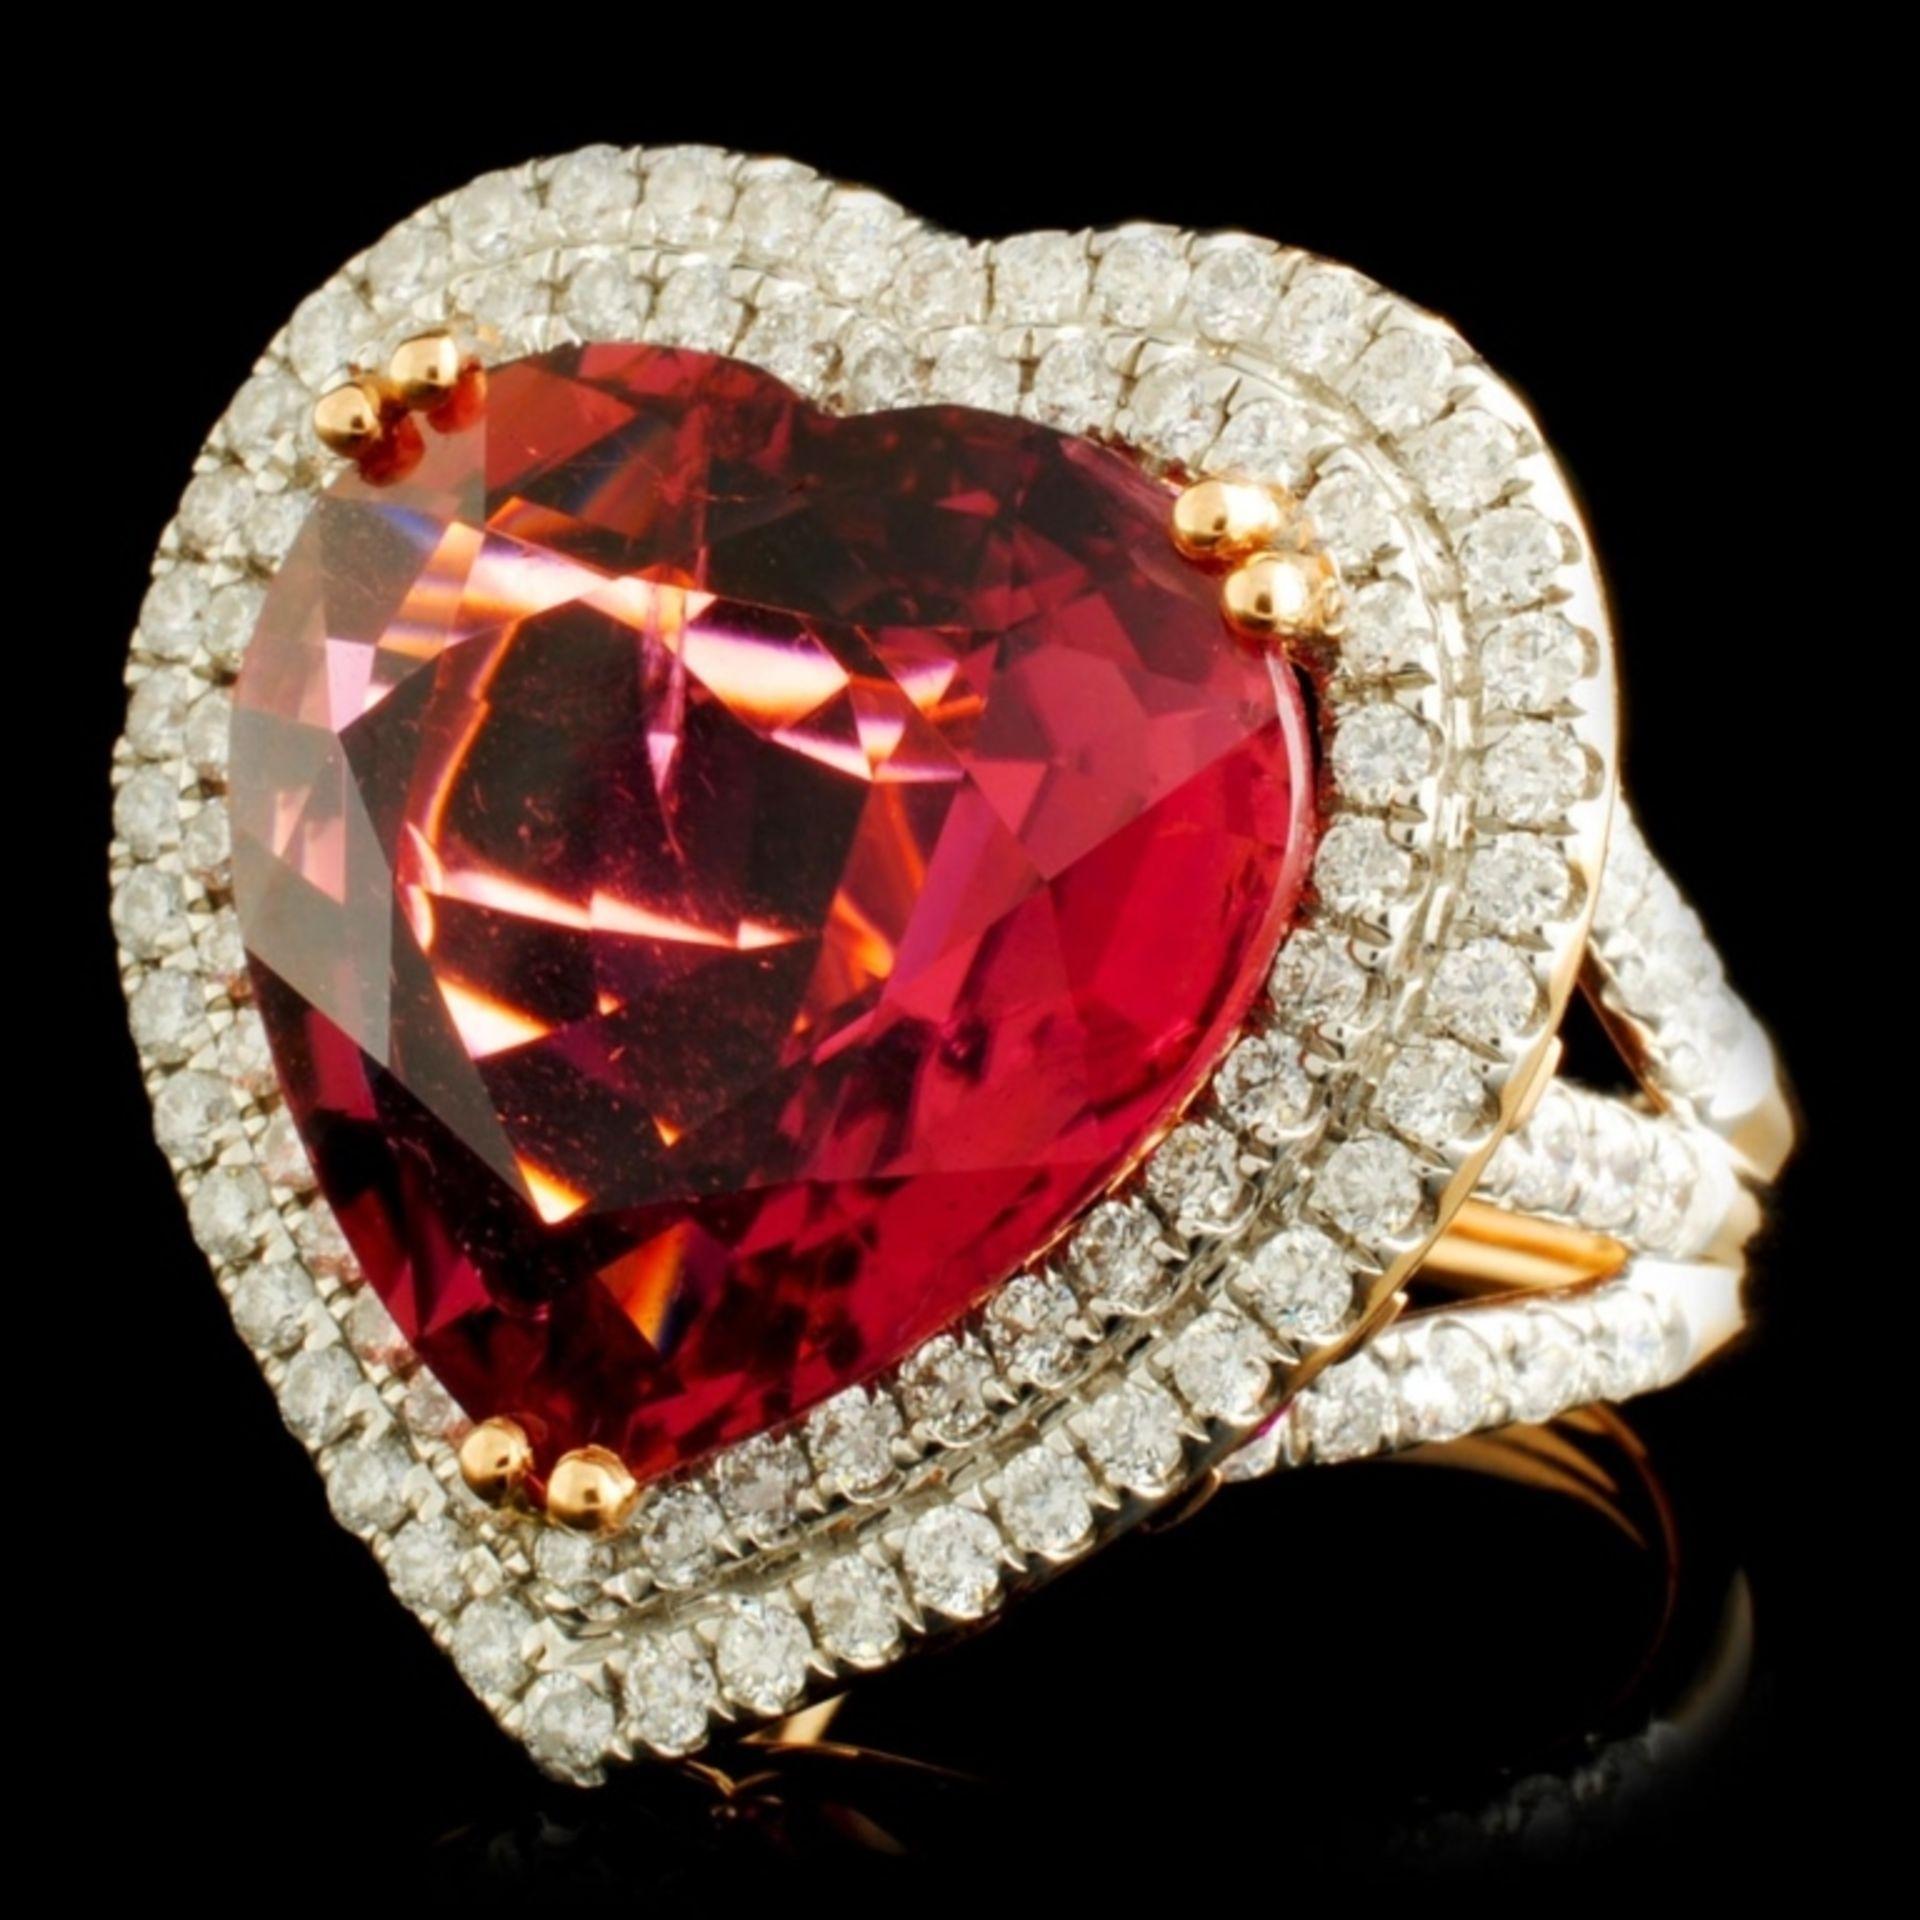 18K Gold 16.47ct Rubellite & 1.76ctw Diamond Ring - Image 2 of 6